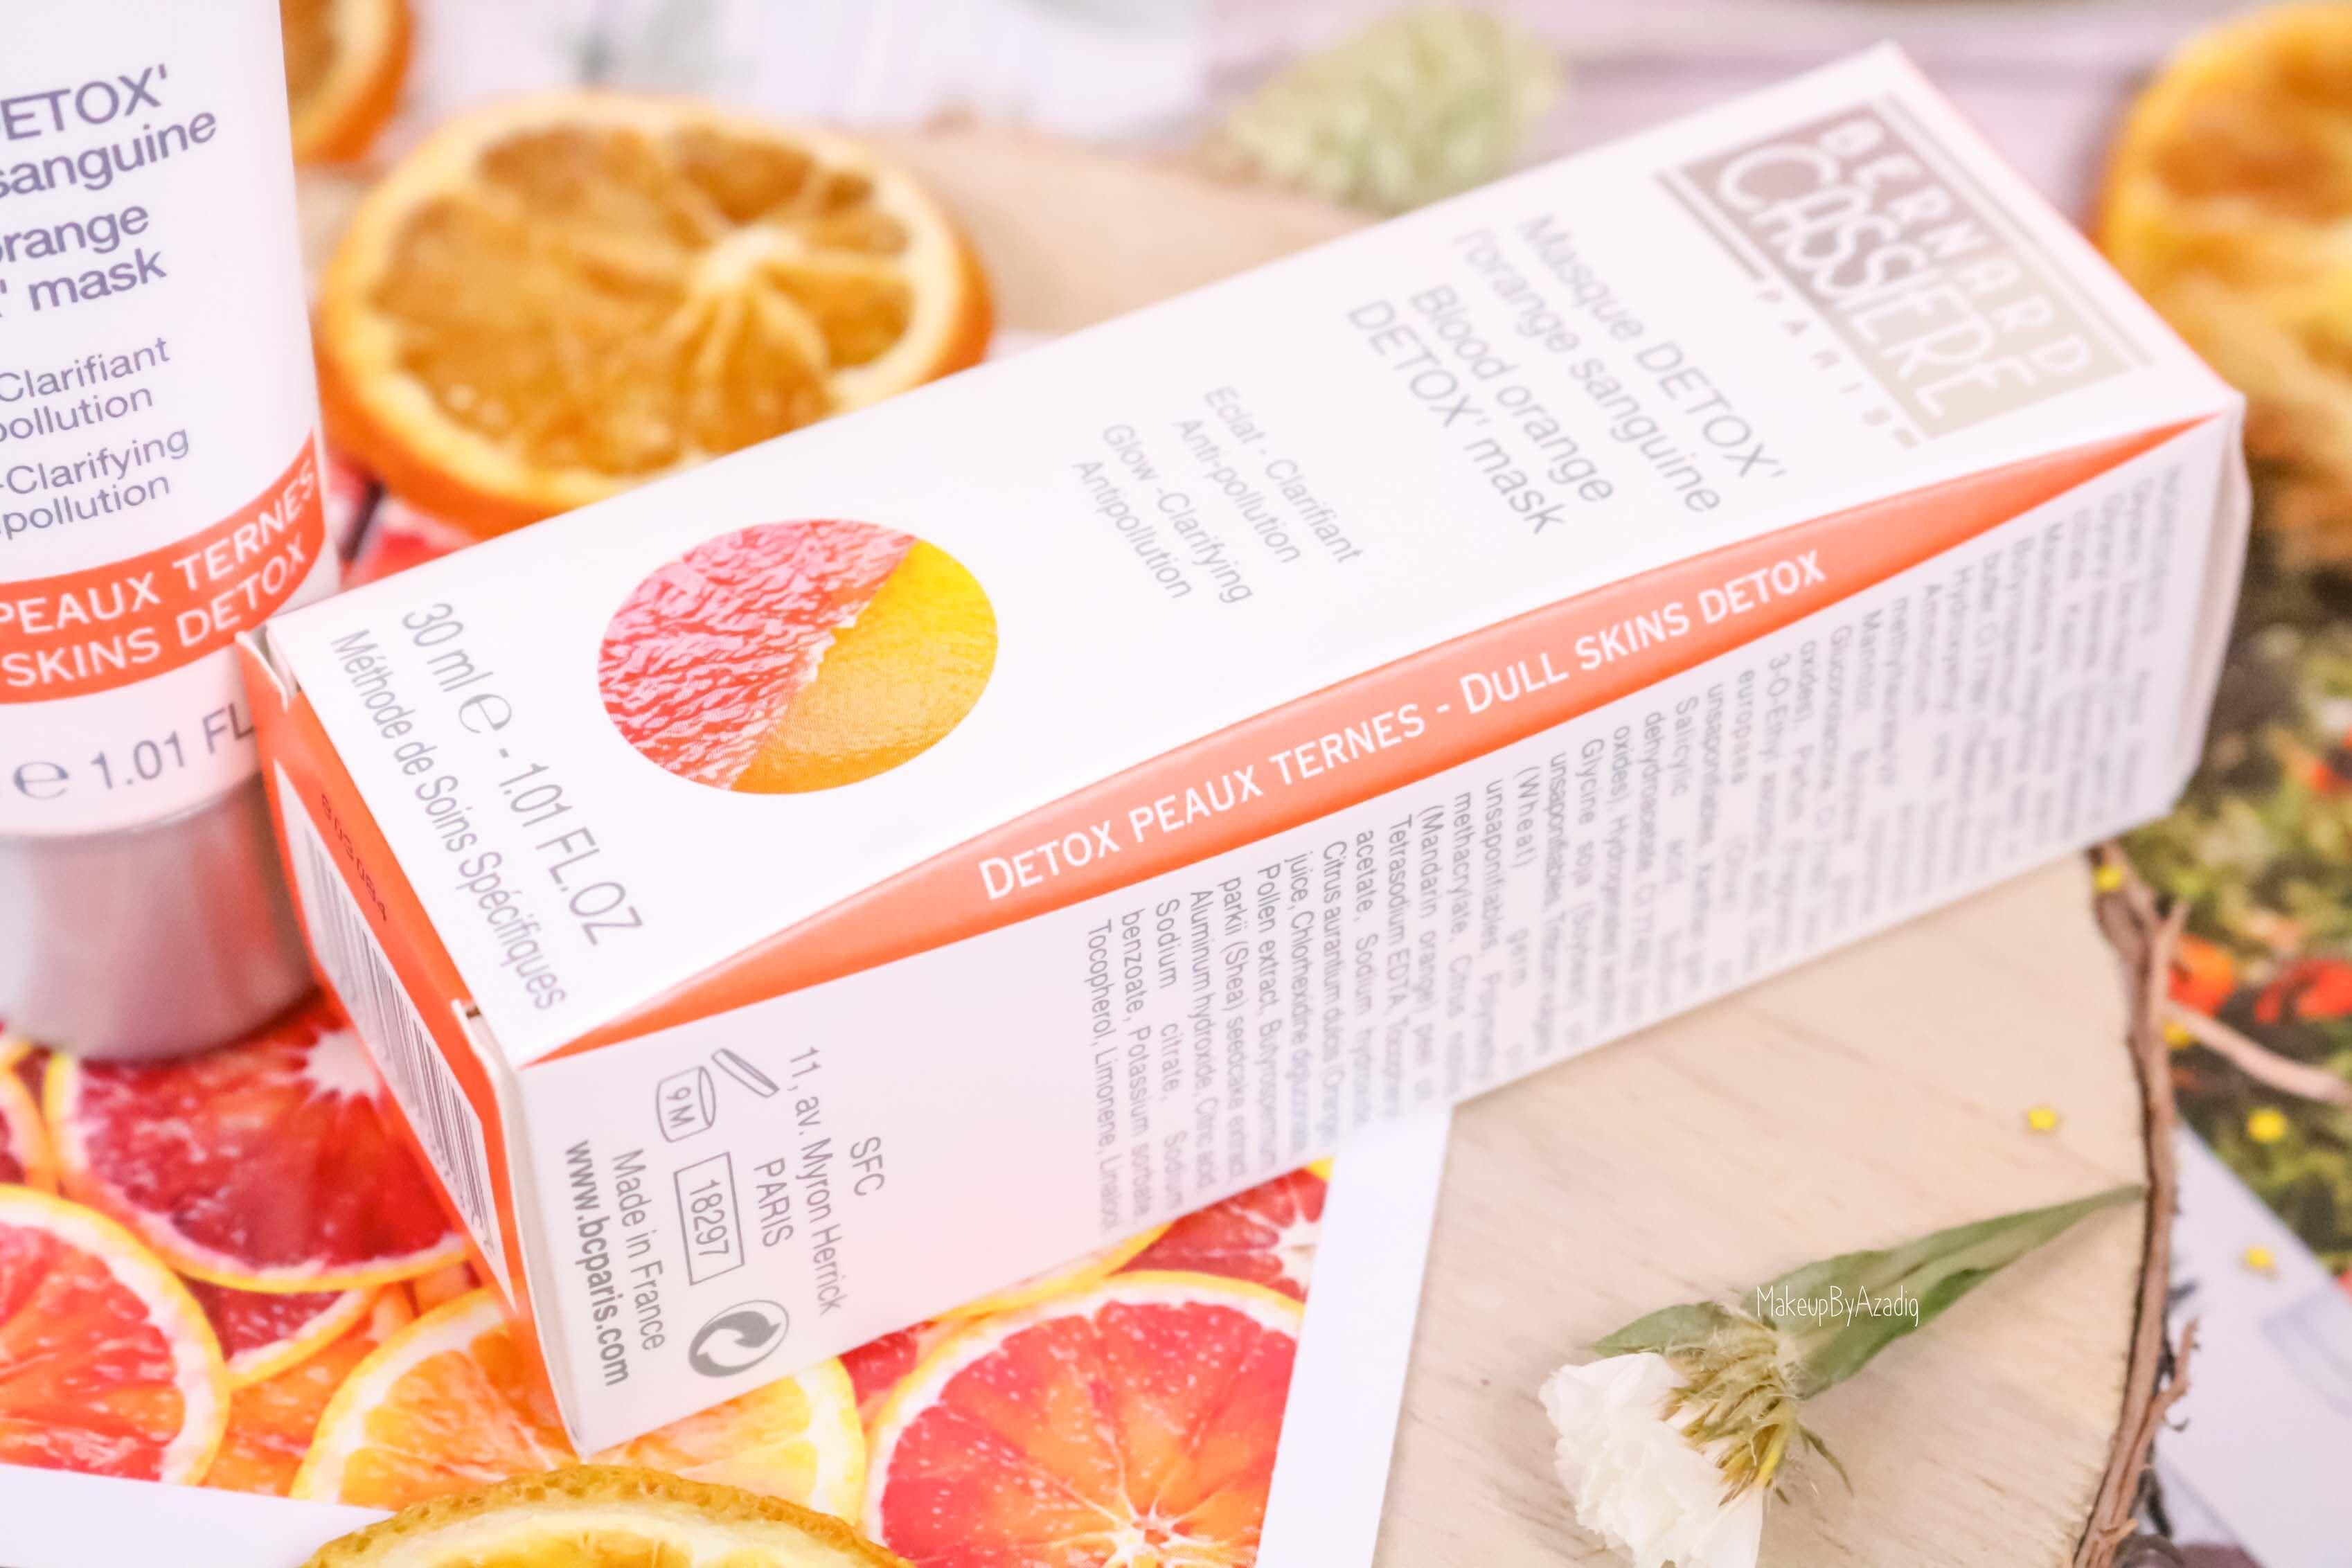 revue-produits-bernard-cassiere-bio-detox-orange-sanguine-masque-paris-institut-concentre-nuit-avis-prix-soin-makeupbyazadig-skin